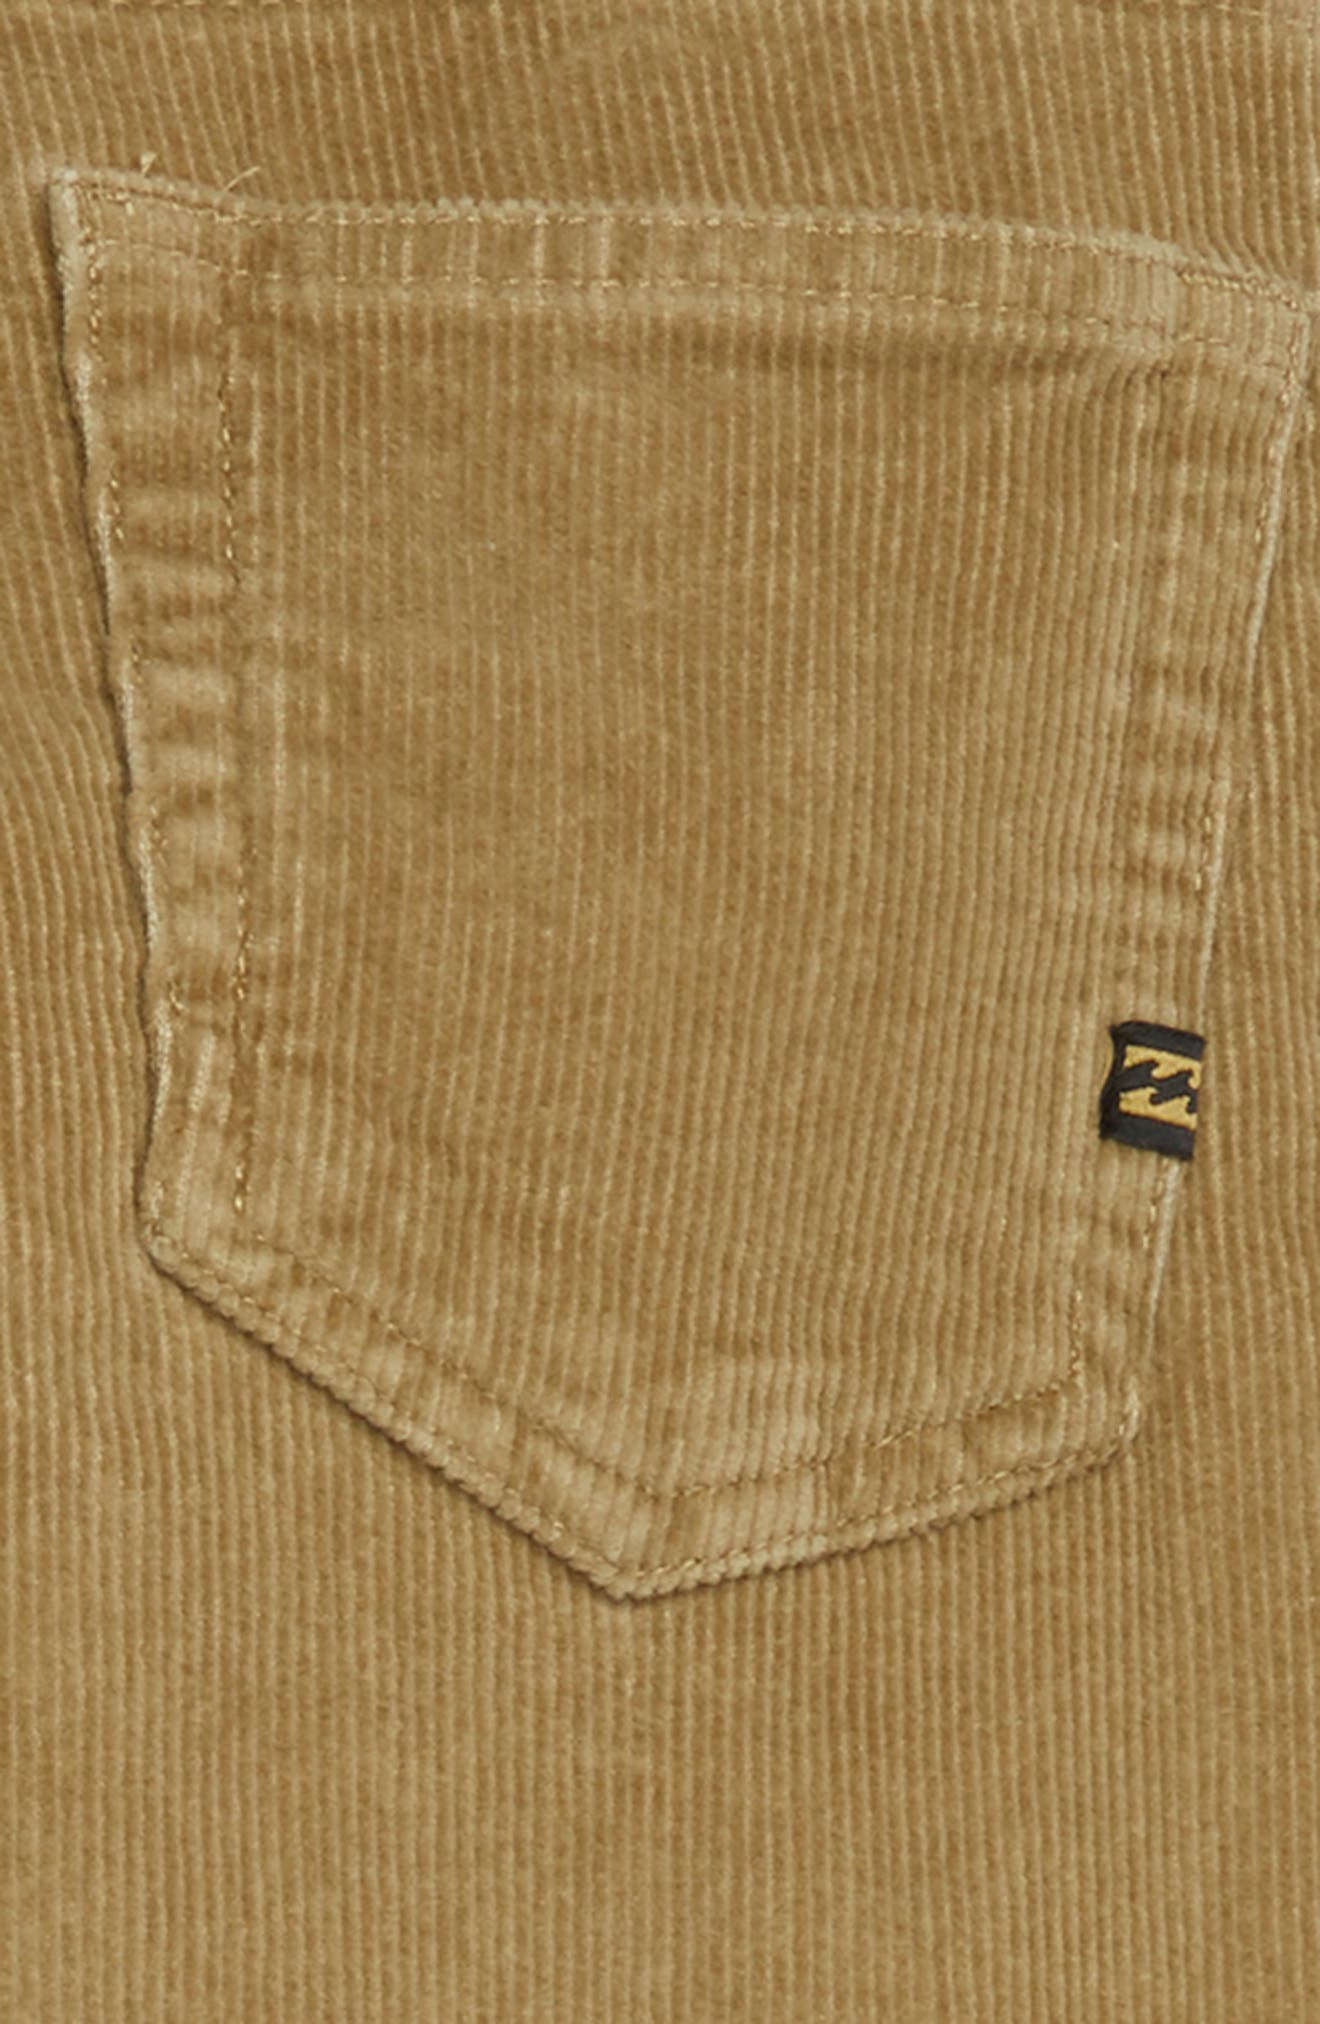 Outsider Corduroy Pants,                             Alternate thumbnail 3, color,                             GRAVEL